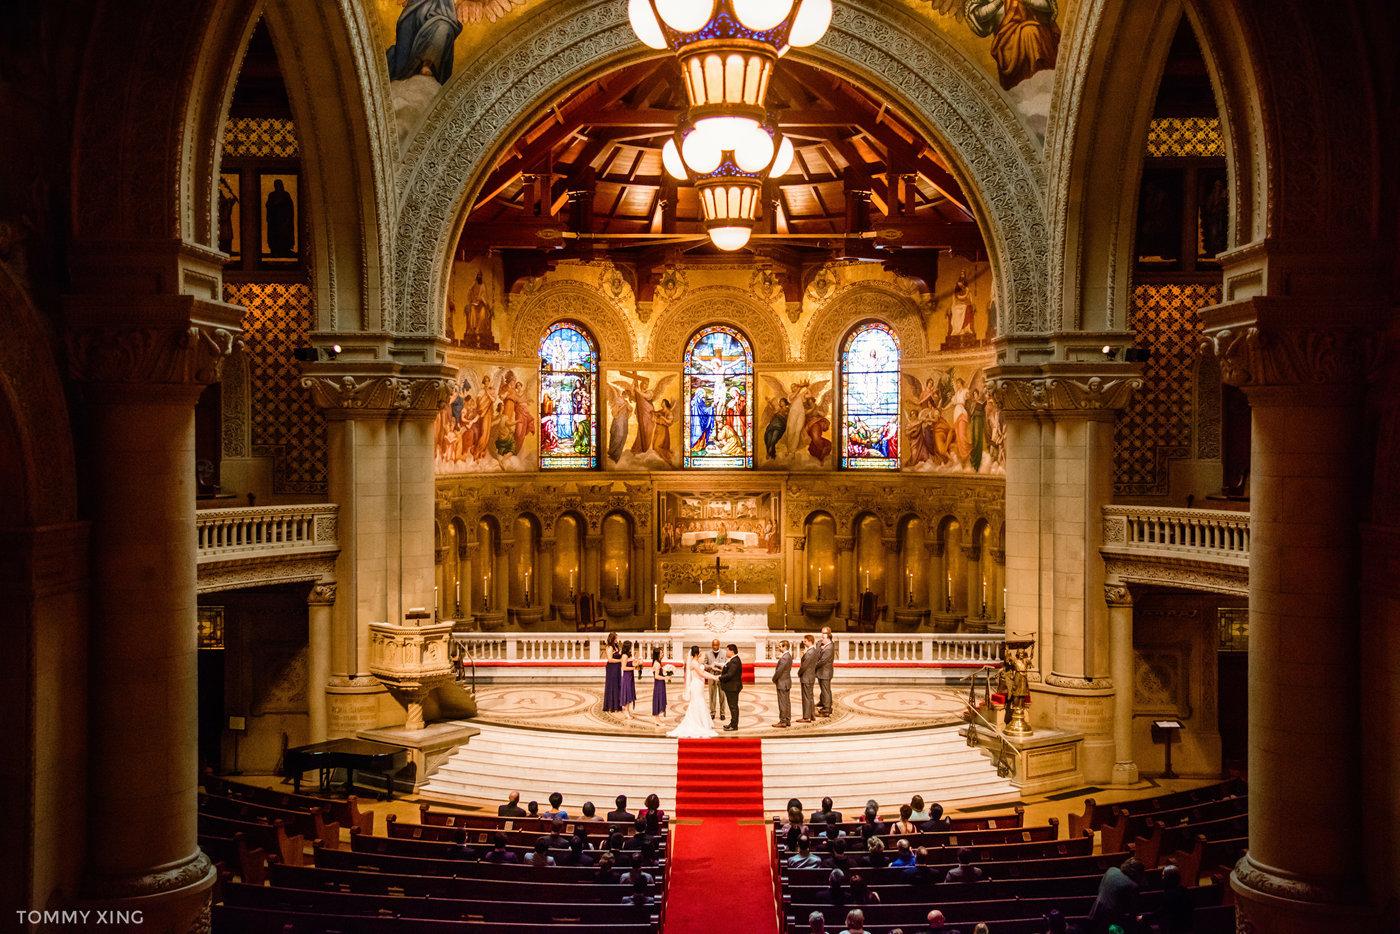 STANFORD MEMORIAL CHURCH WEDDING - Wenjie & Chengcheng - SAN FRANCISCO BAY AREA 斯坦福教堂婚礼跟拍 - 洛杉矶婚礼婚纱照摄影师 Tommy Xing Photography098.jpg